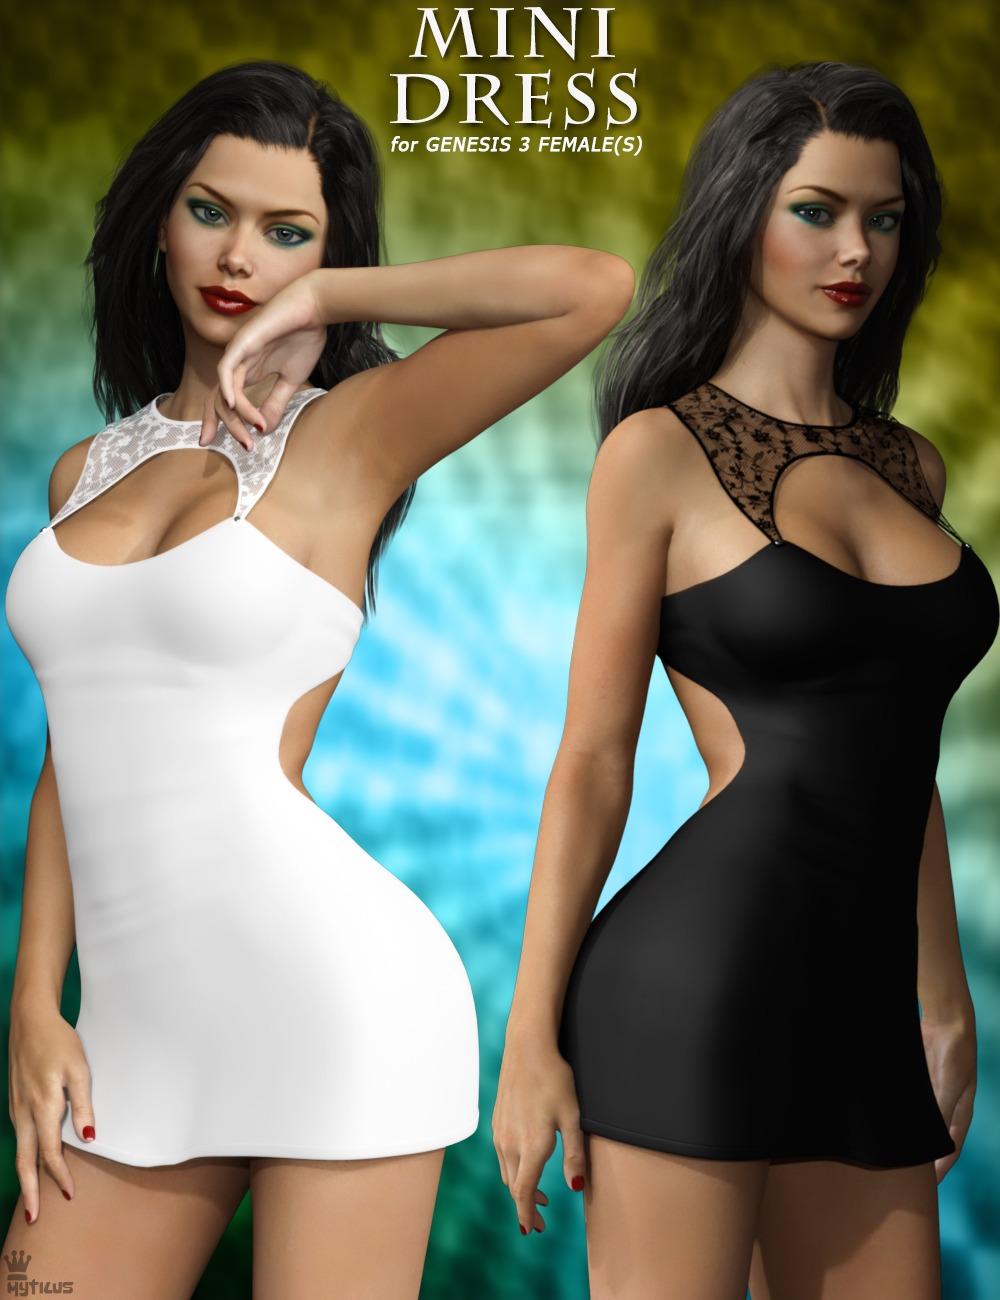 Mini Dress For Genesis 3 Females_DAZ3D下载站